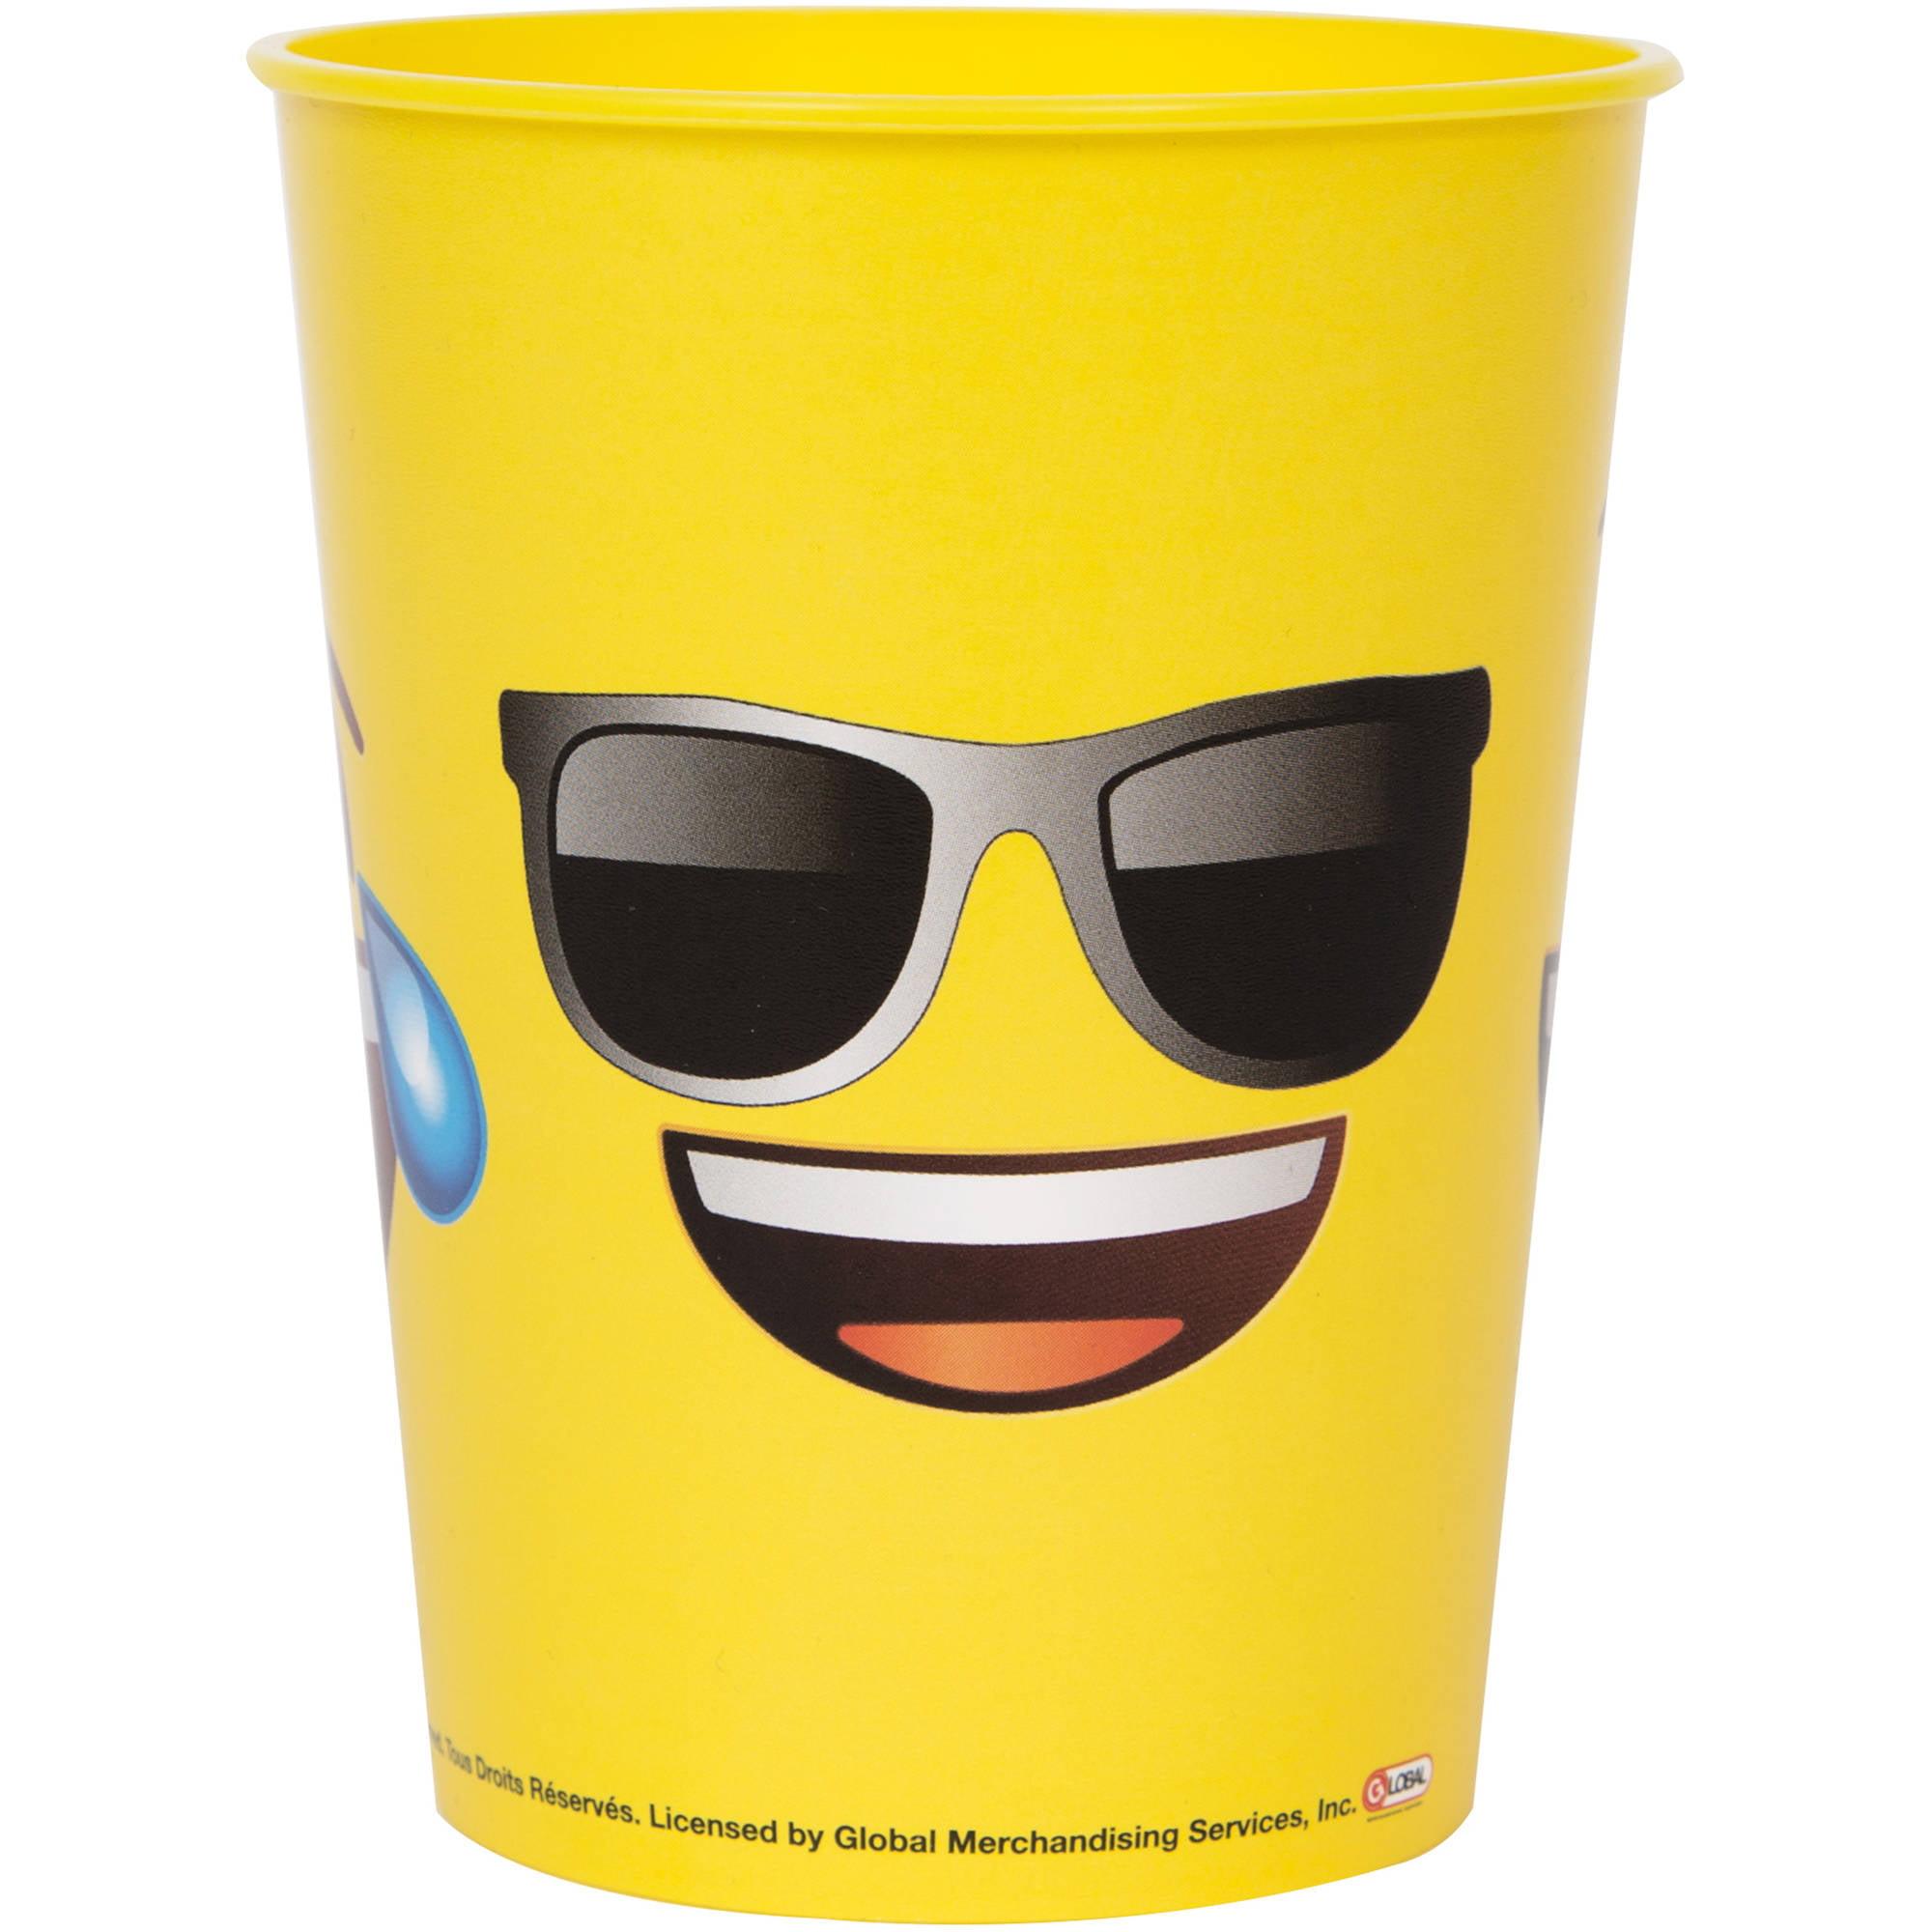 Emoji Party Supplies - Walmart.com